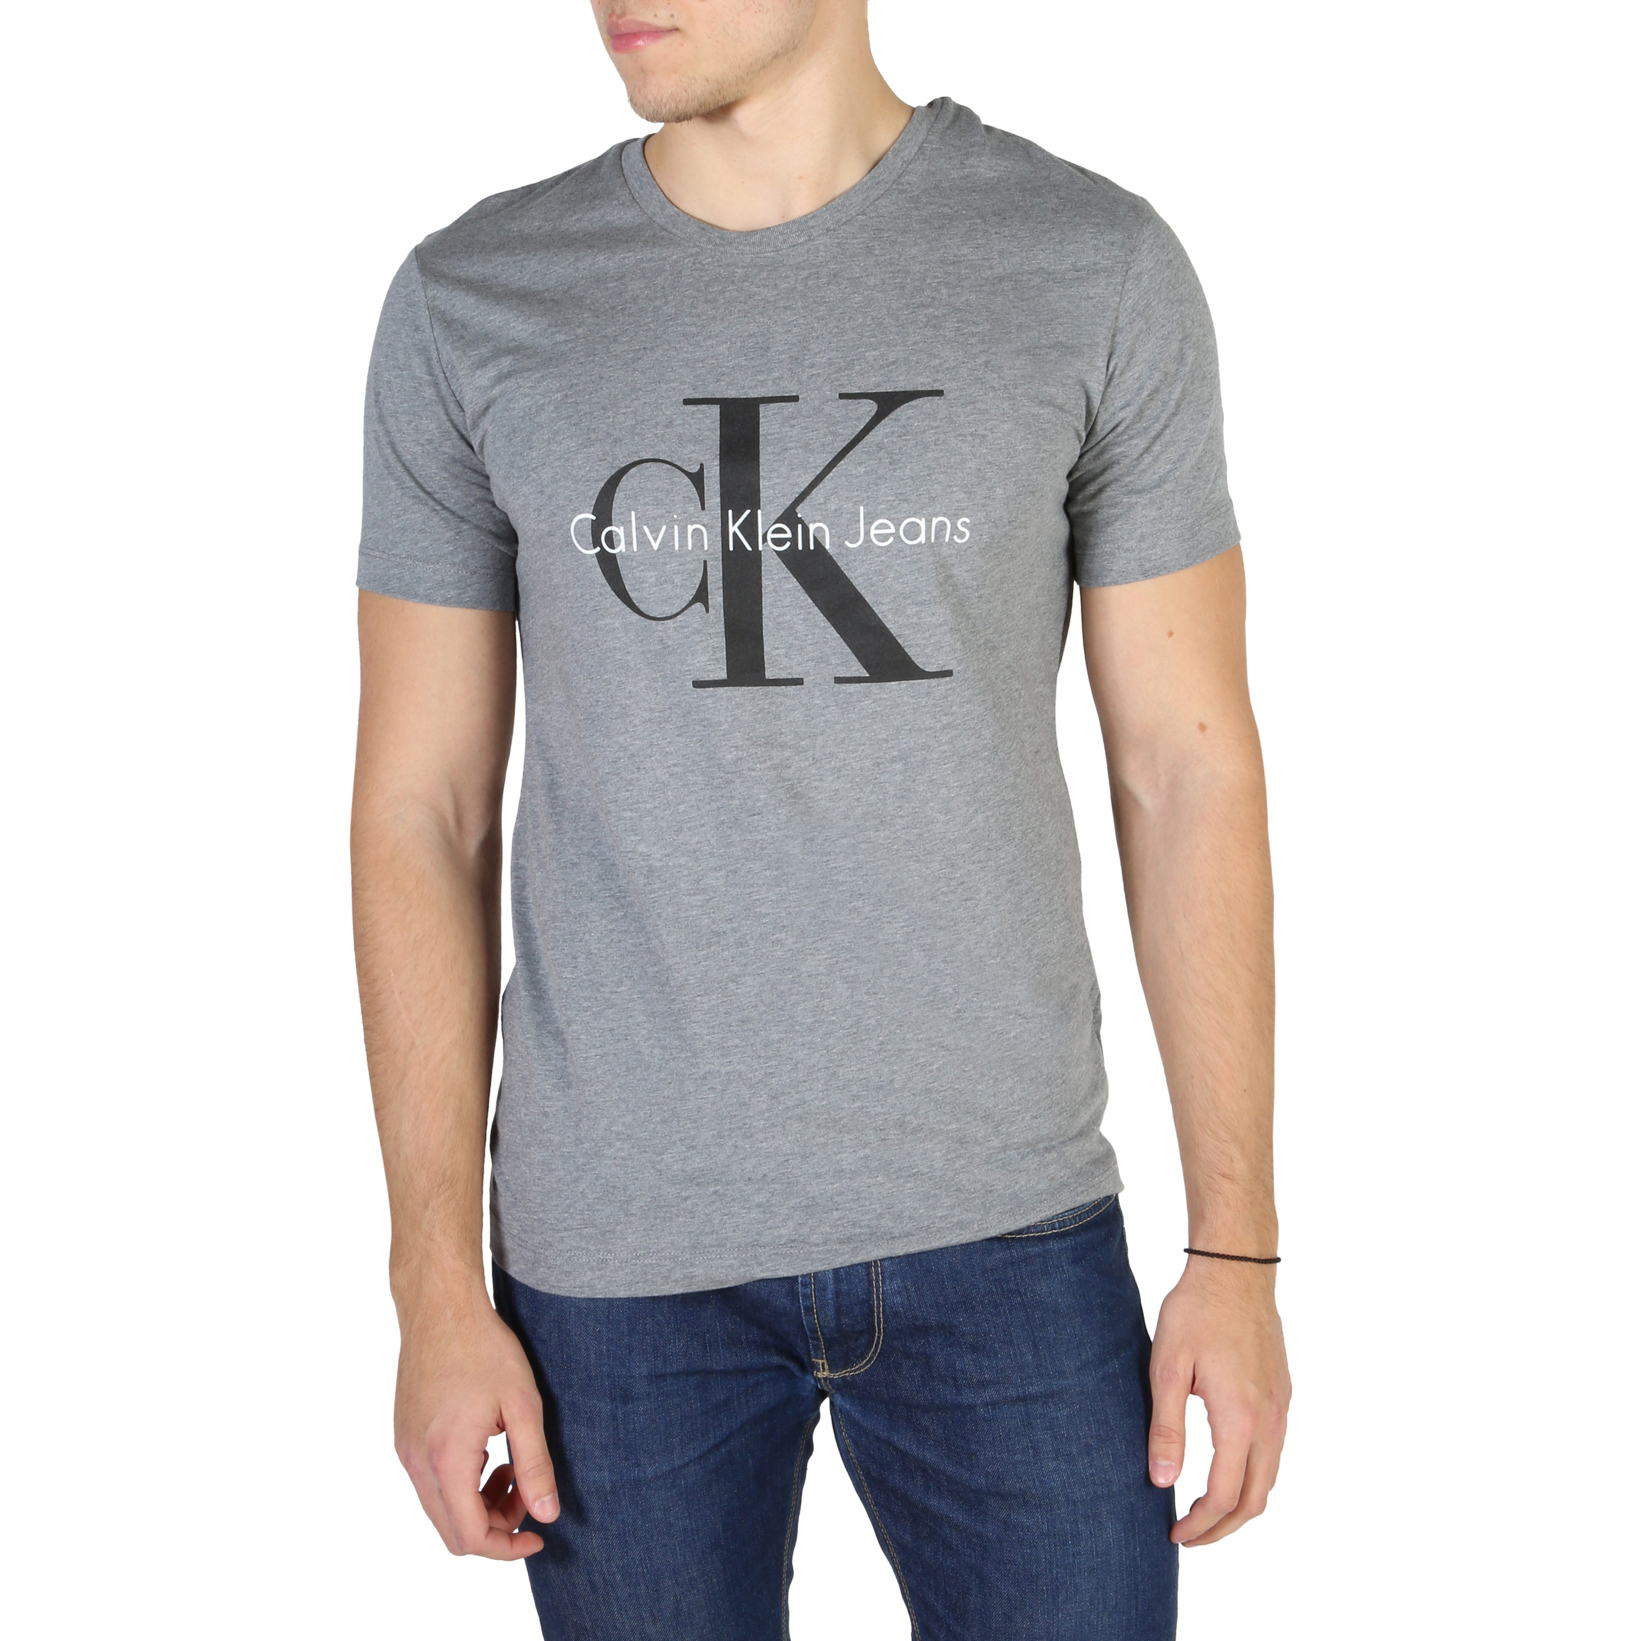 Calvin-Klein-J3IJ302251-Uomo-Grigio-104159